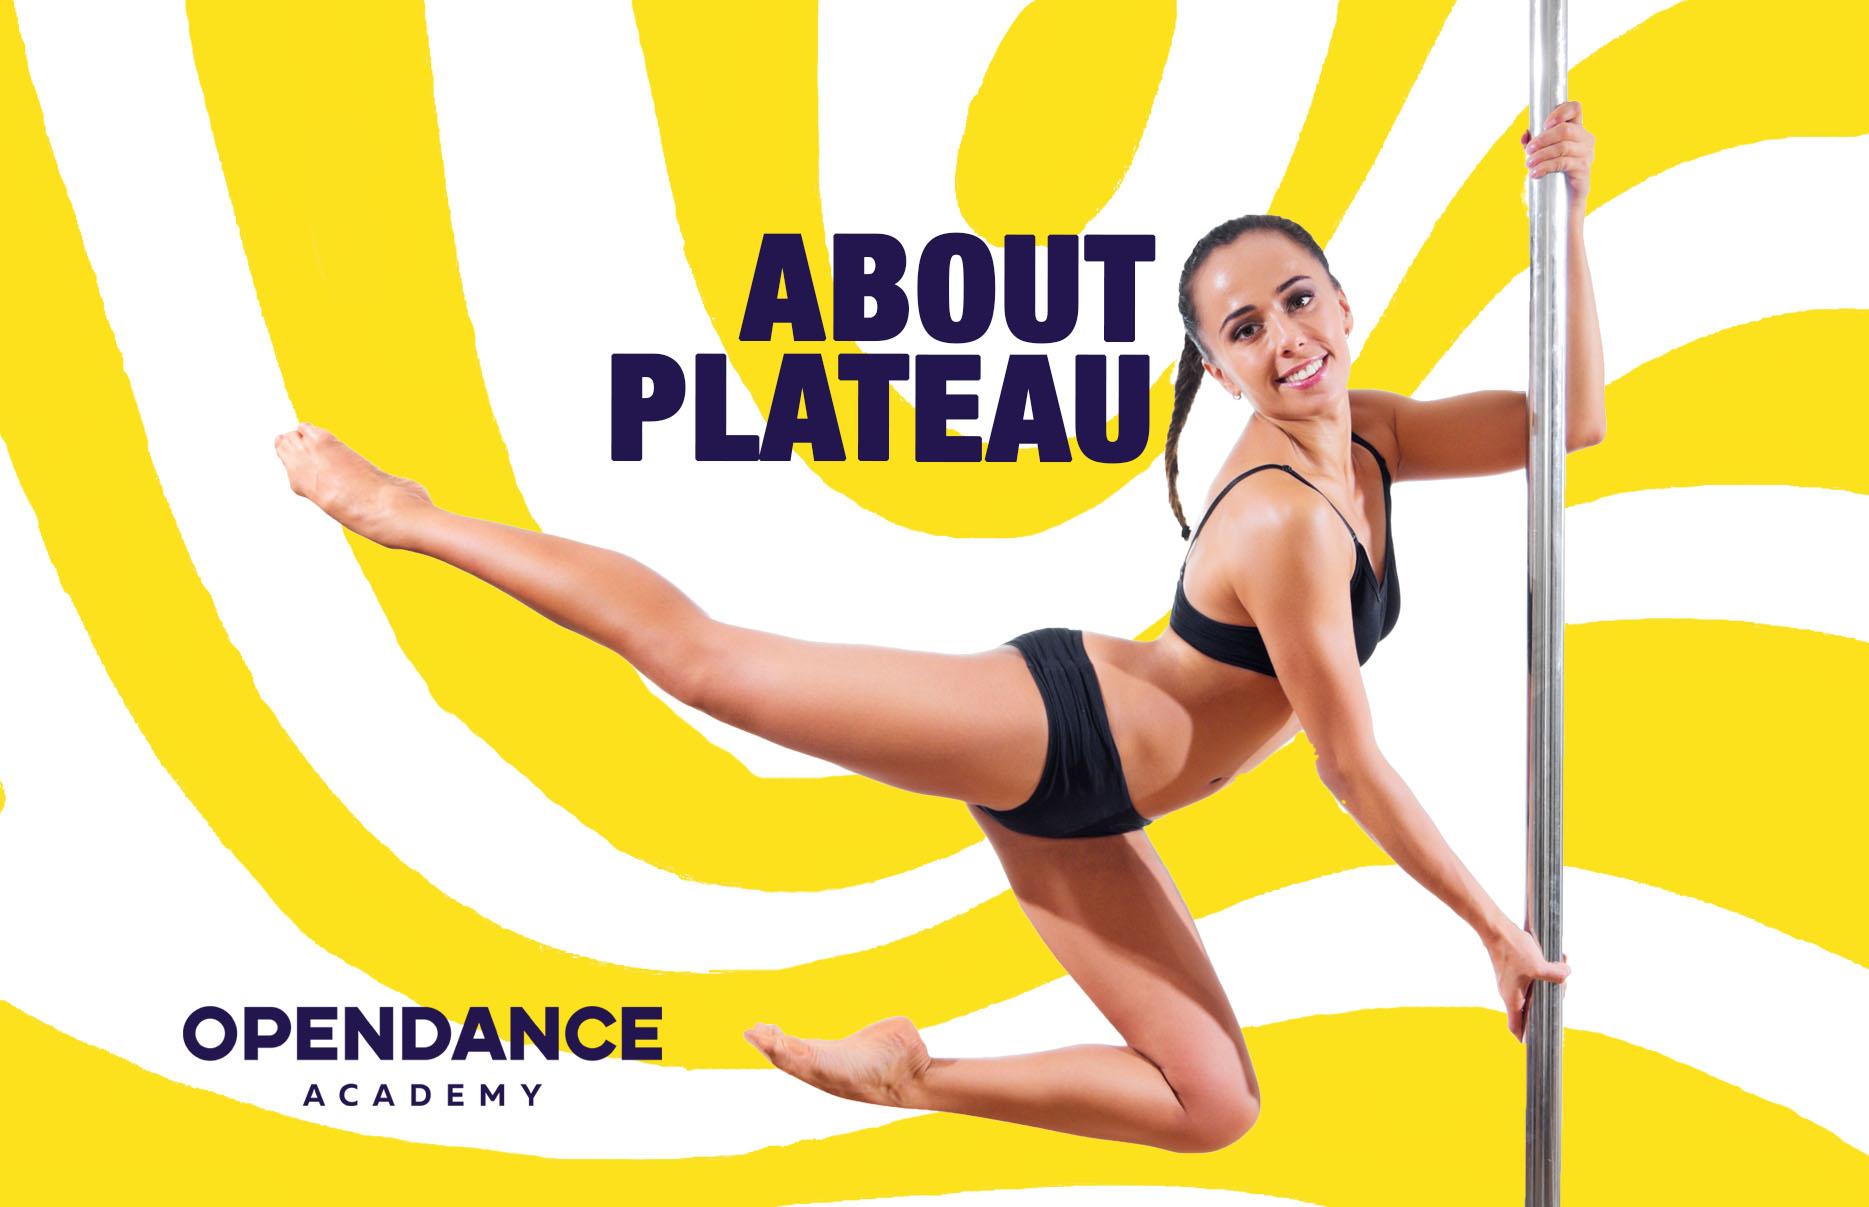 About Plateau